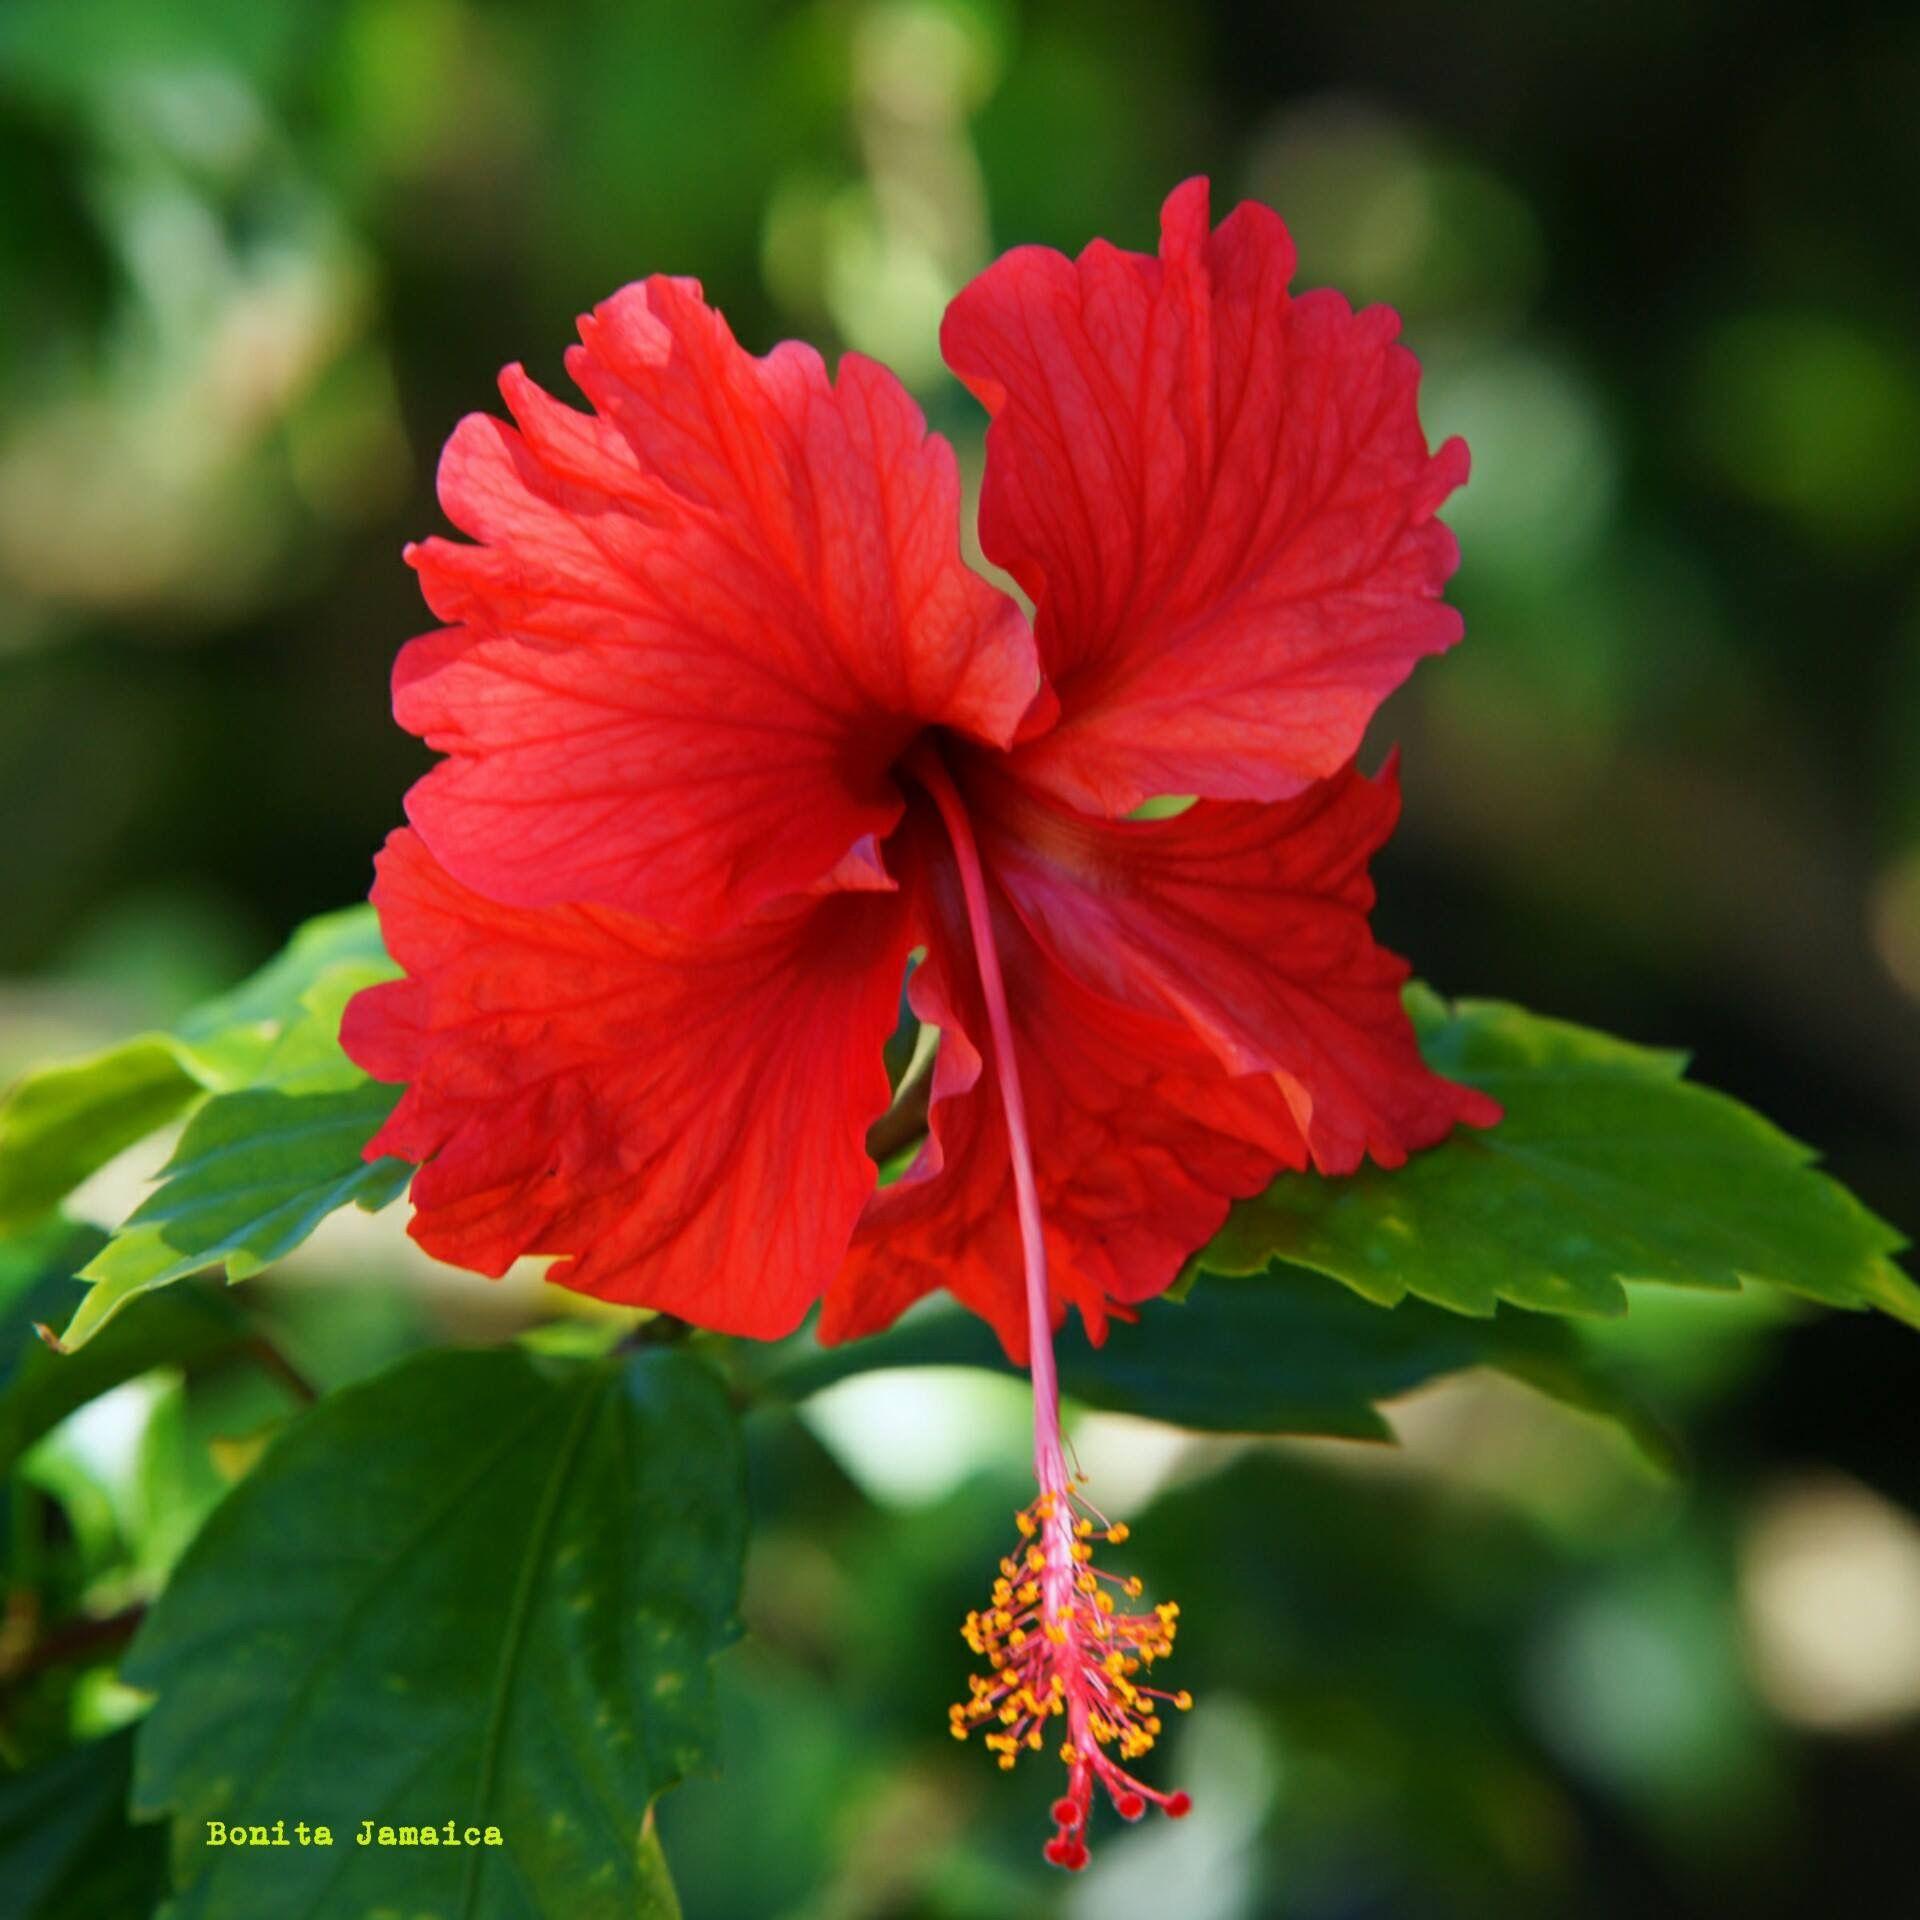 Jamaica flowers jamaica pinterest caribbean jamaica flowers izmirmasajfo